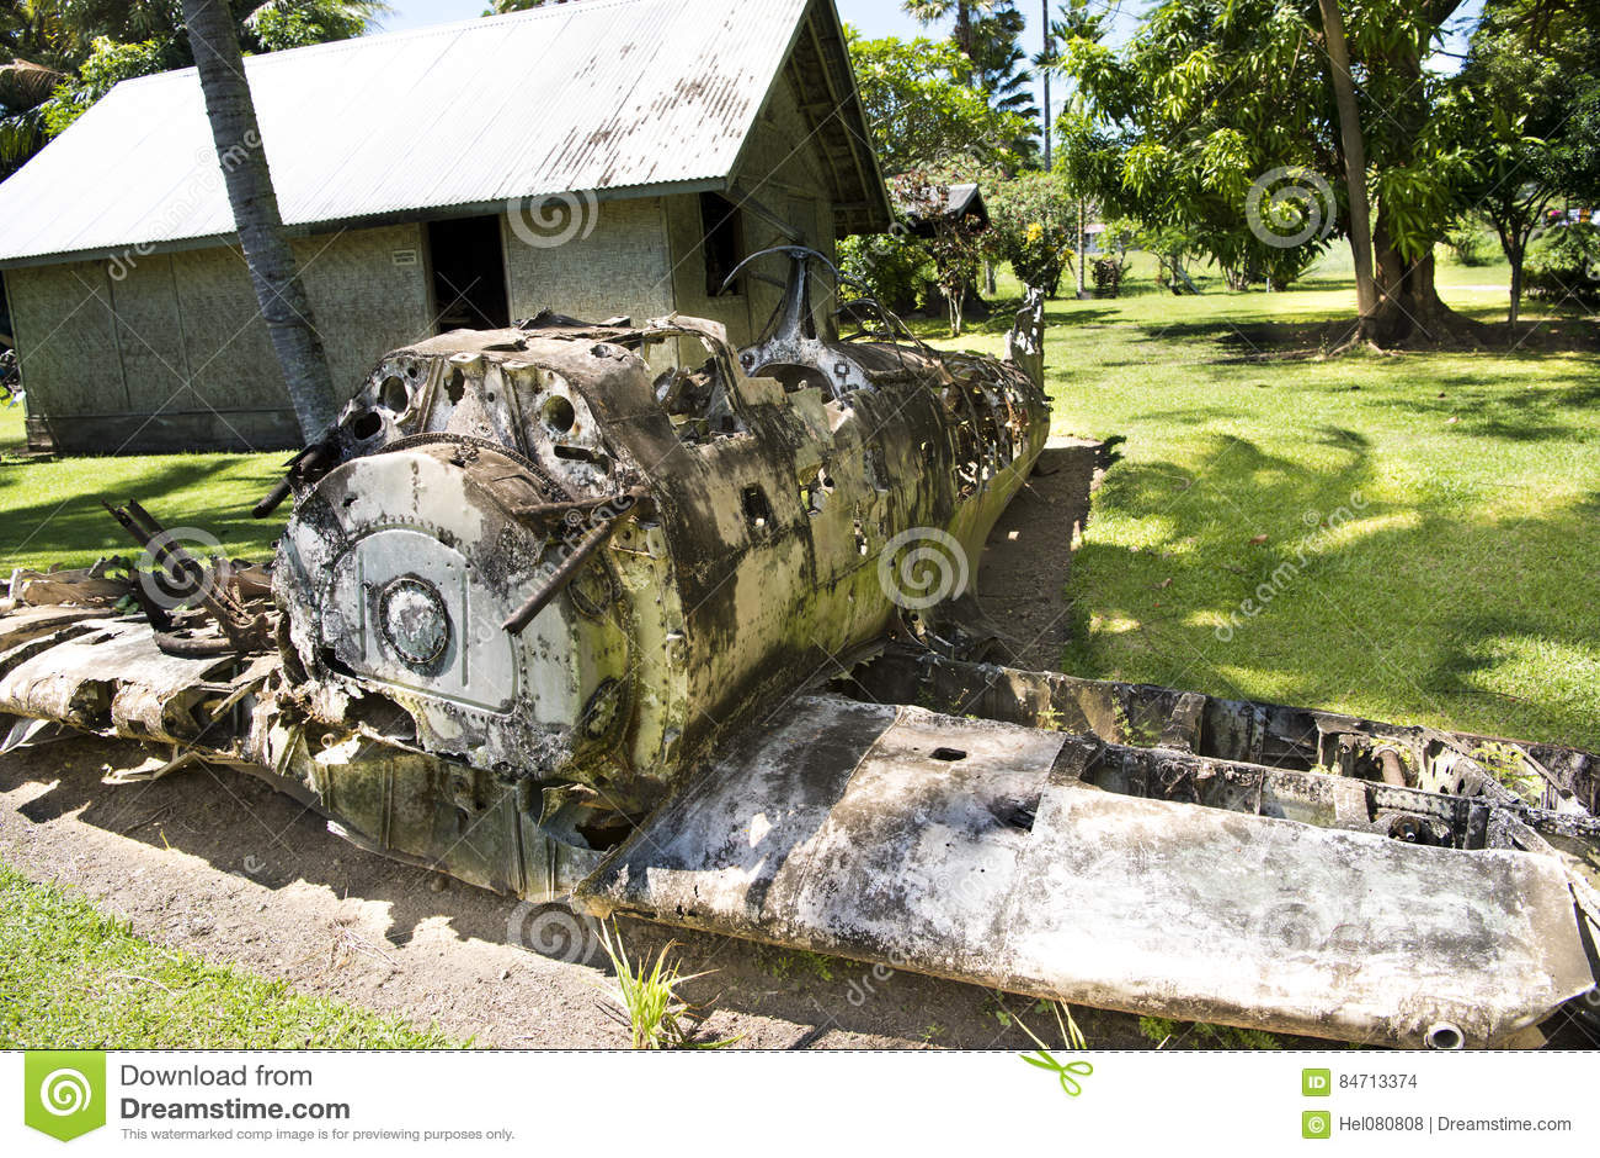 World war ii aircraft rabaul royalty free stock image for Decorati 2 guerra mondiale